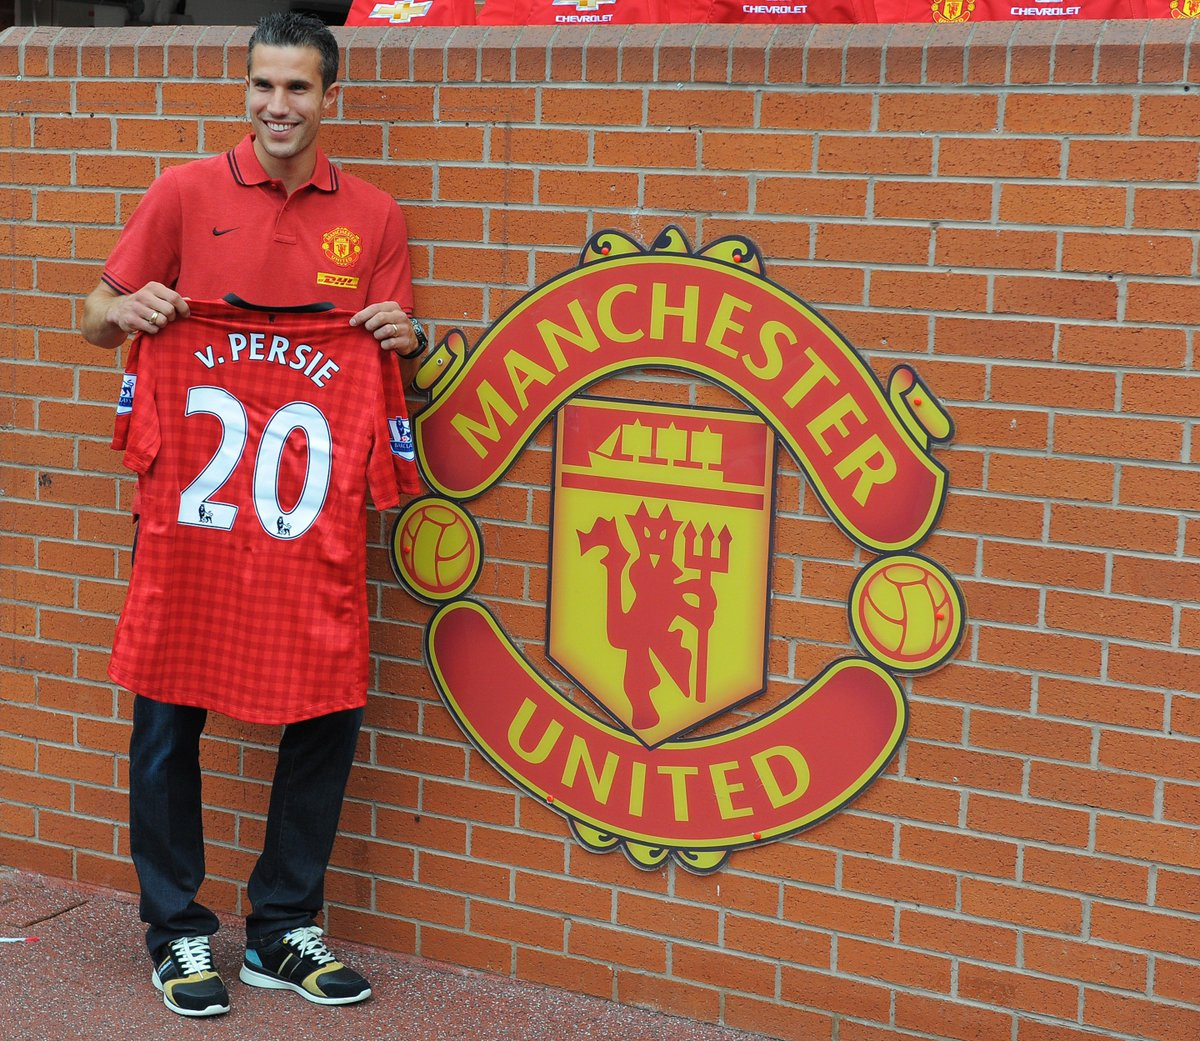 Manchester United unveil new signing Robin van Persie in 2012.   #UCL #FlashbackFriday <br>http://pic.twitter.com/EzNOHmLvDE